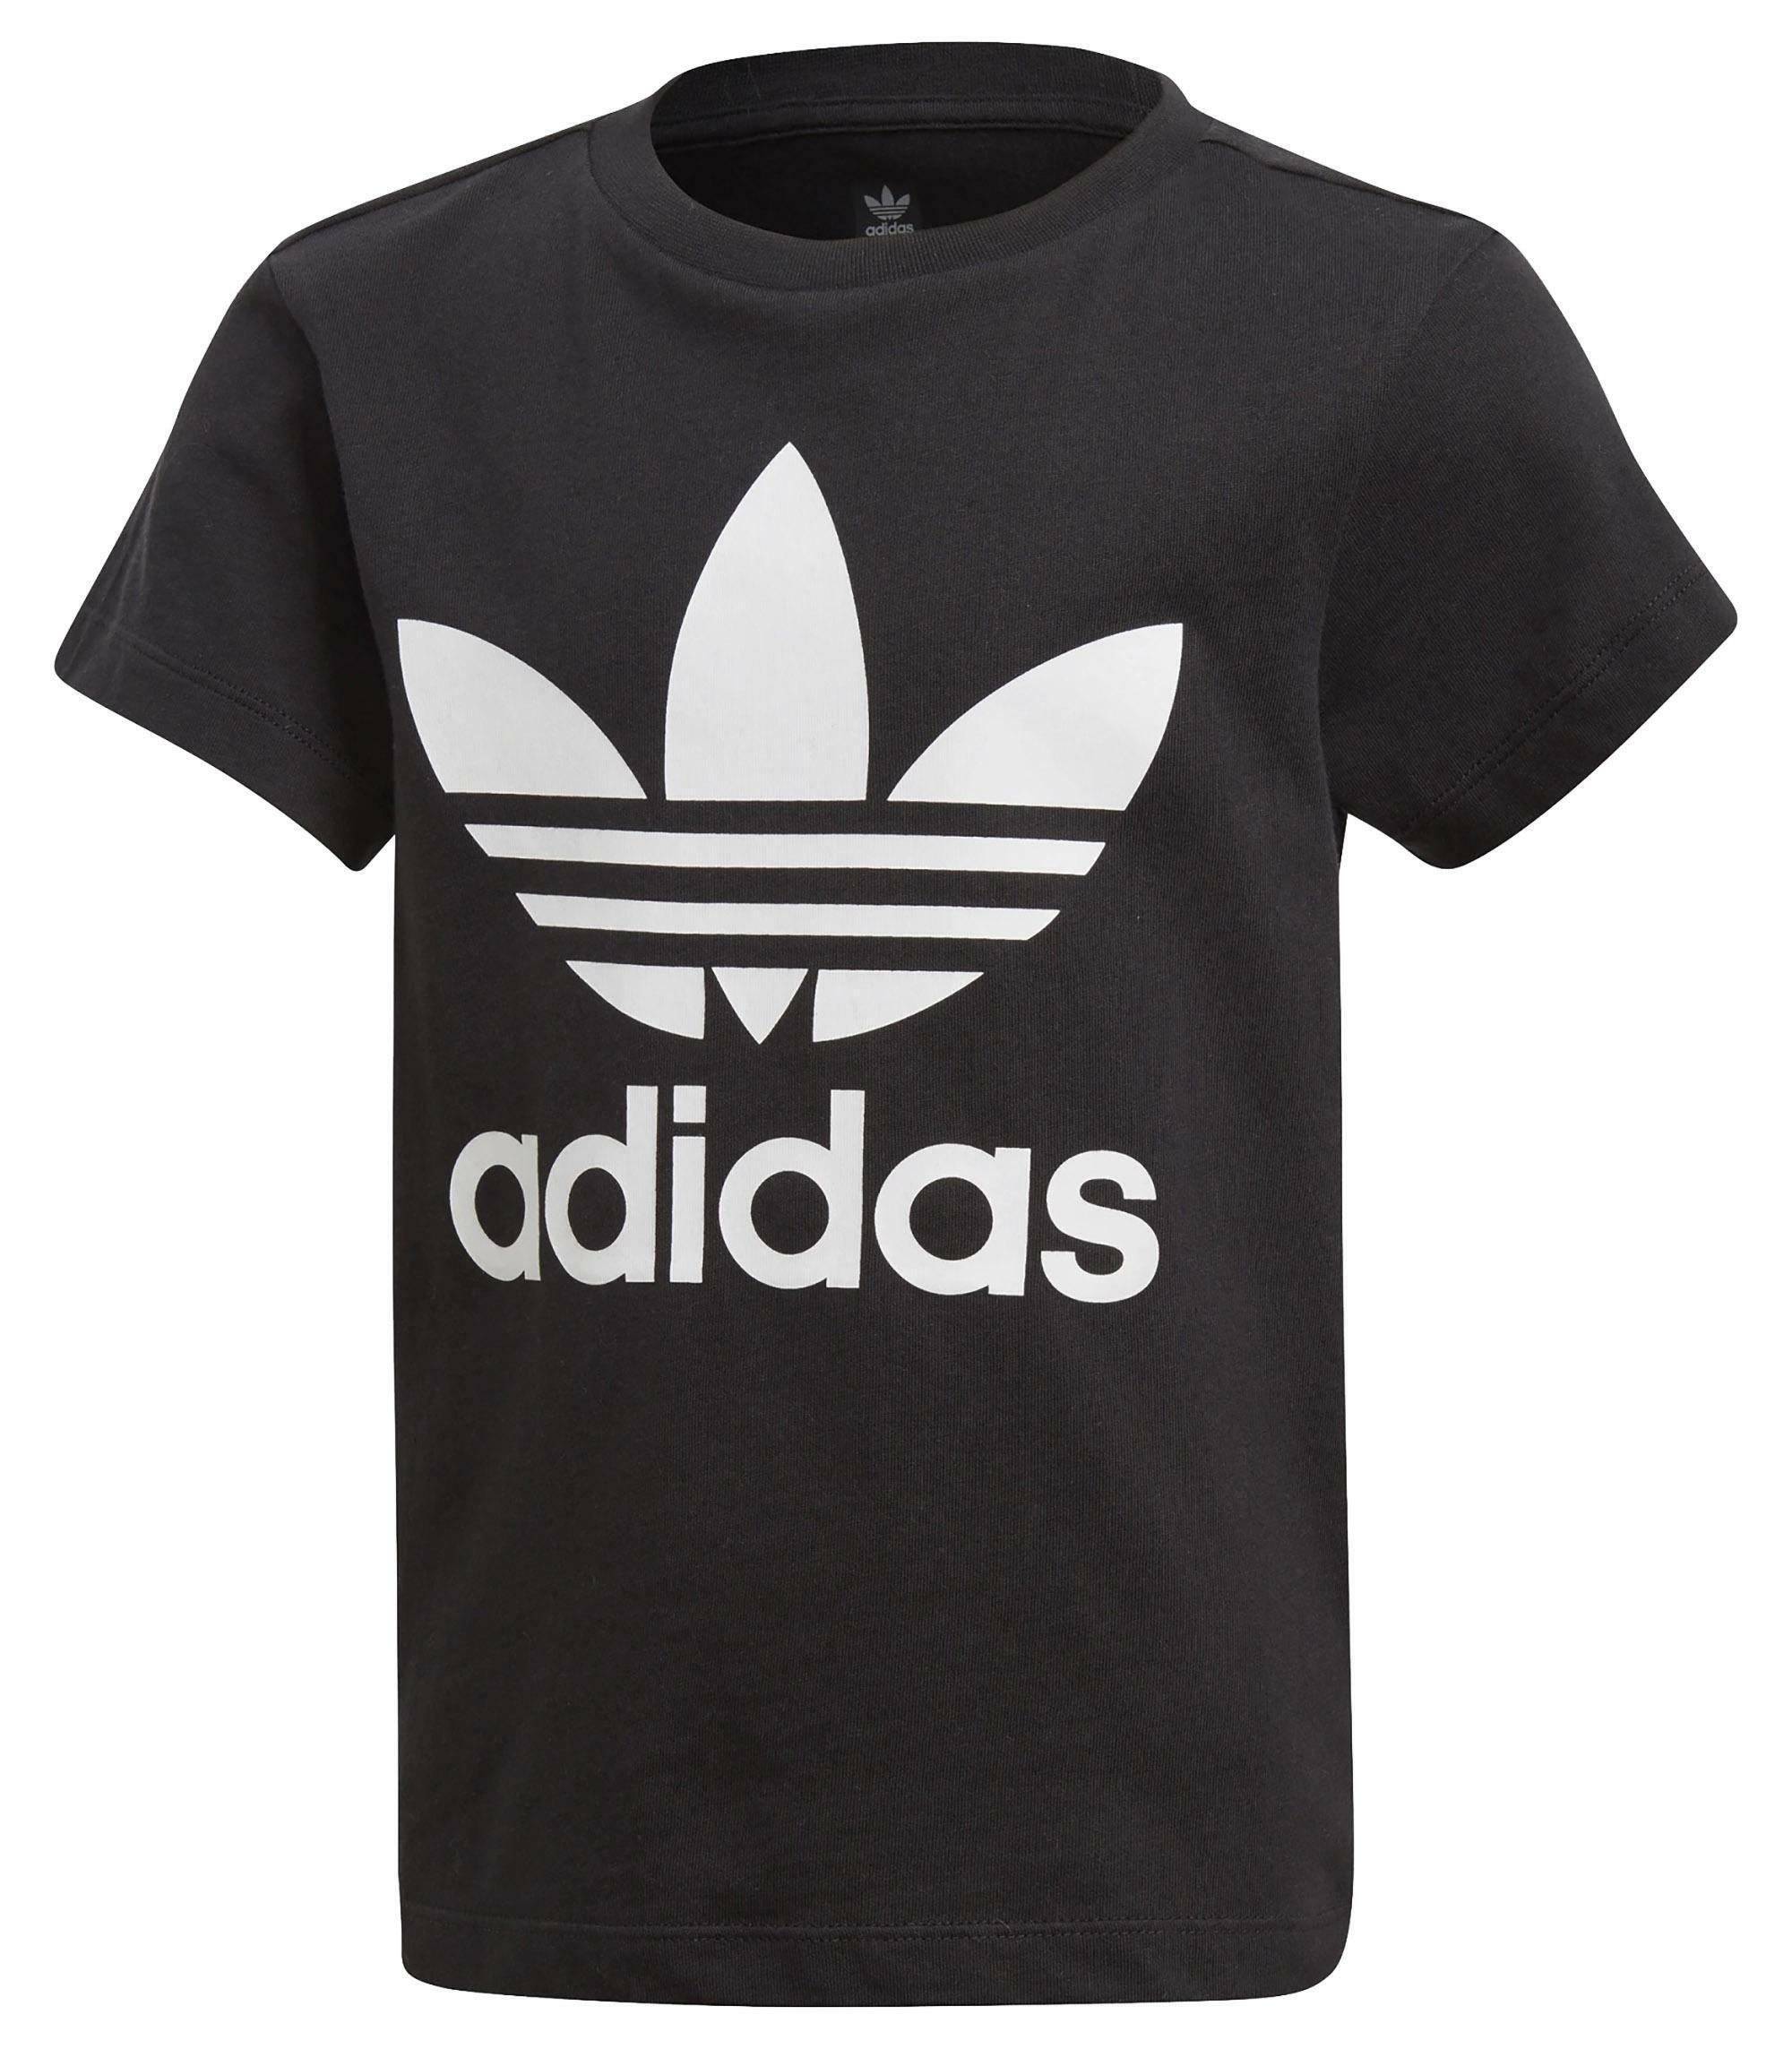 adidas trefoil tee t-shirt bambino nera dv2858